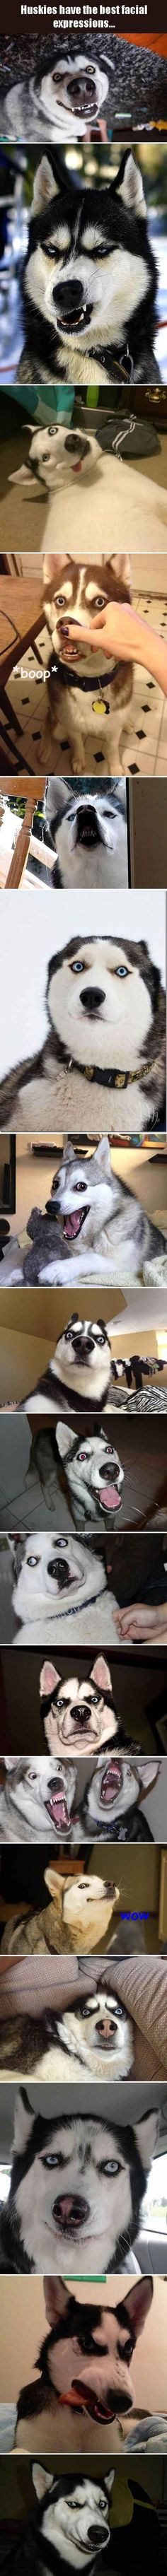 The 2nd picture looks like a Siberian Husky Elvis. lol #dogsfunnyjokes